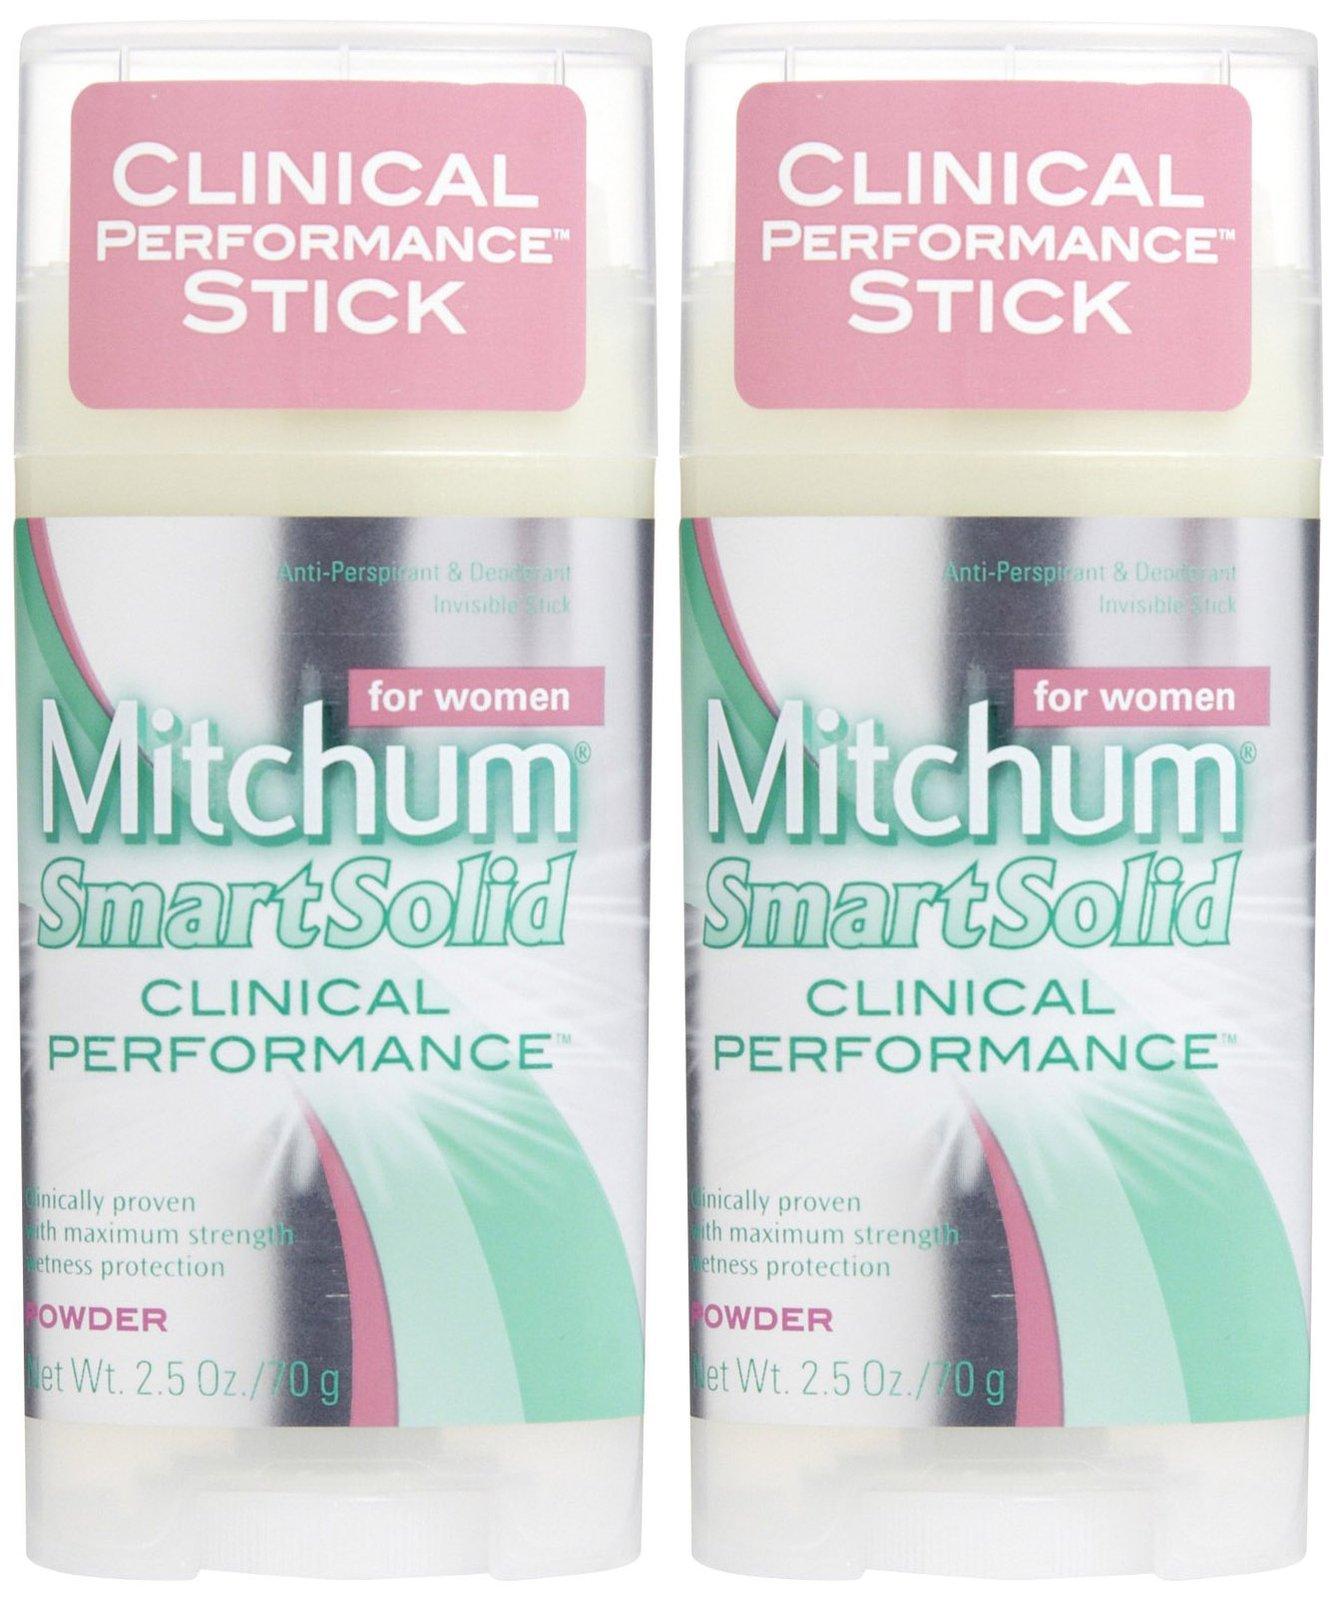 Mitchum Women Smart Solid Clinical Performance Antiperspirant & Deodorant, Powder - 2.5 oz - 2 pk